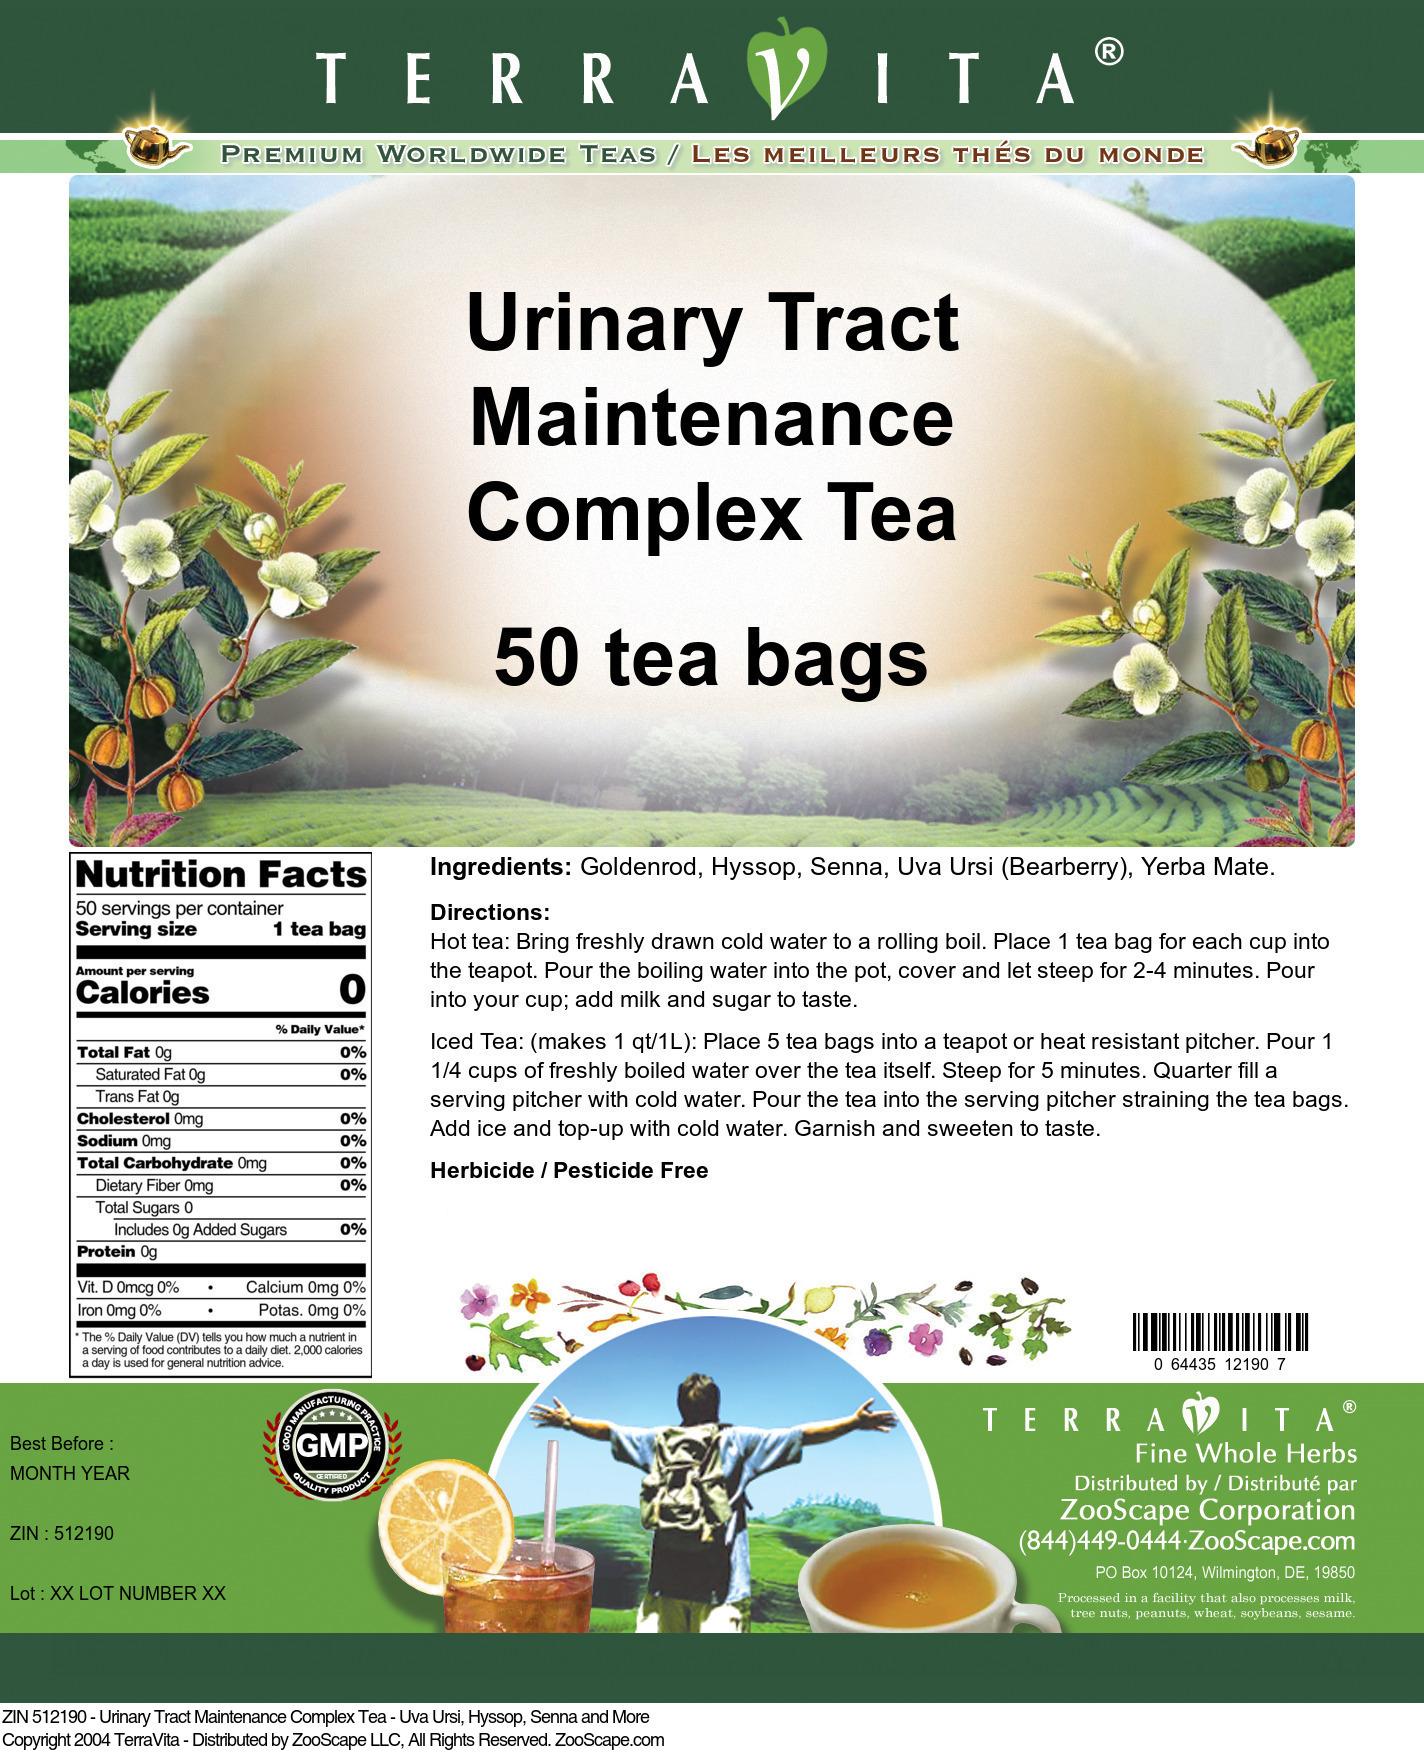 Urinary Tract Maintenance Complex Tea - Uva Ursi, Hyssop, Senna and More